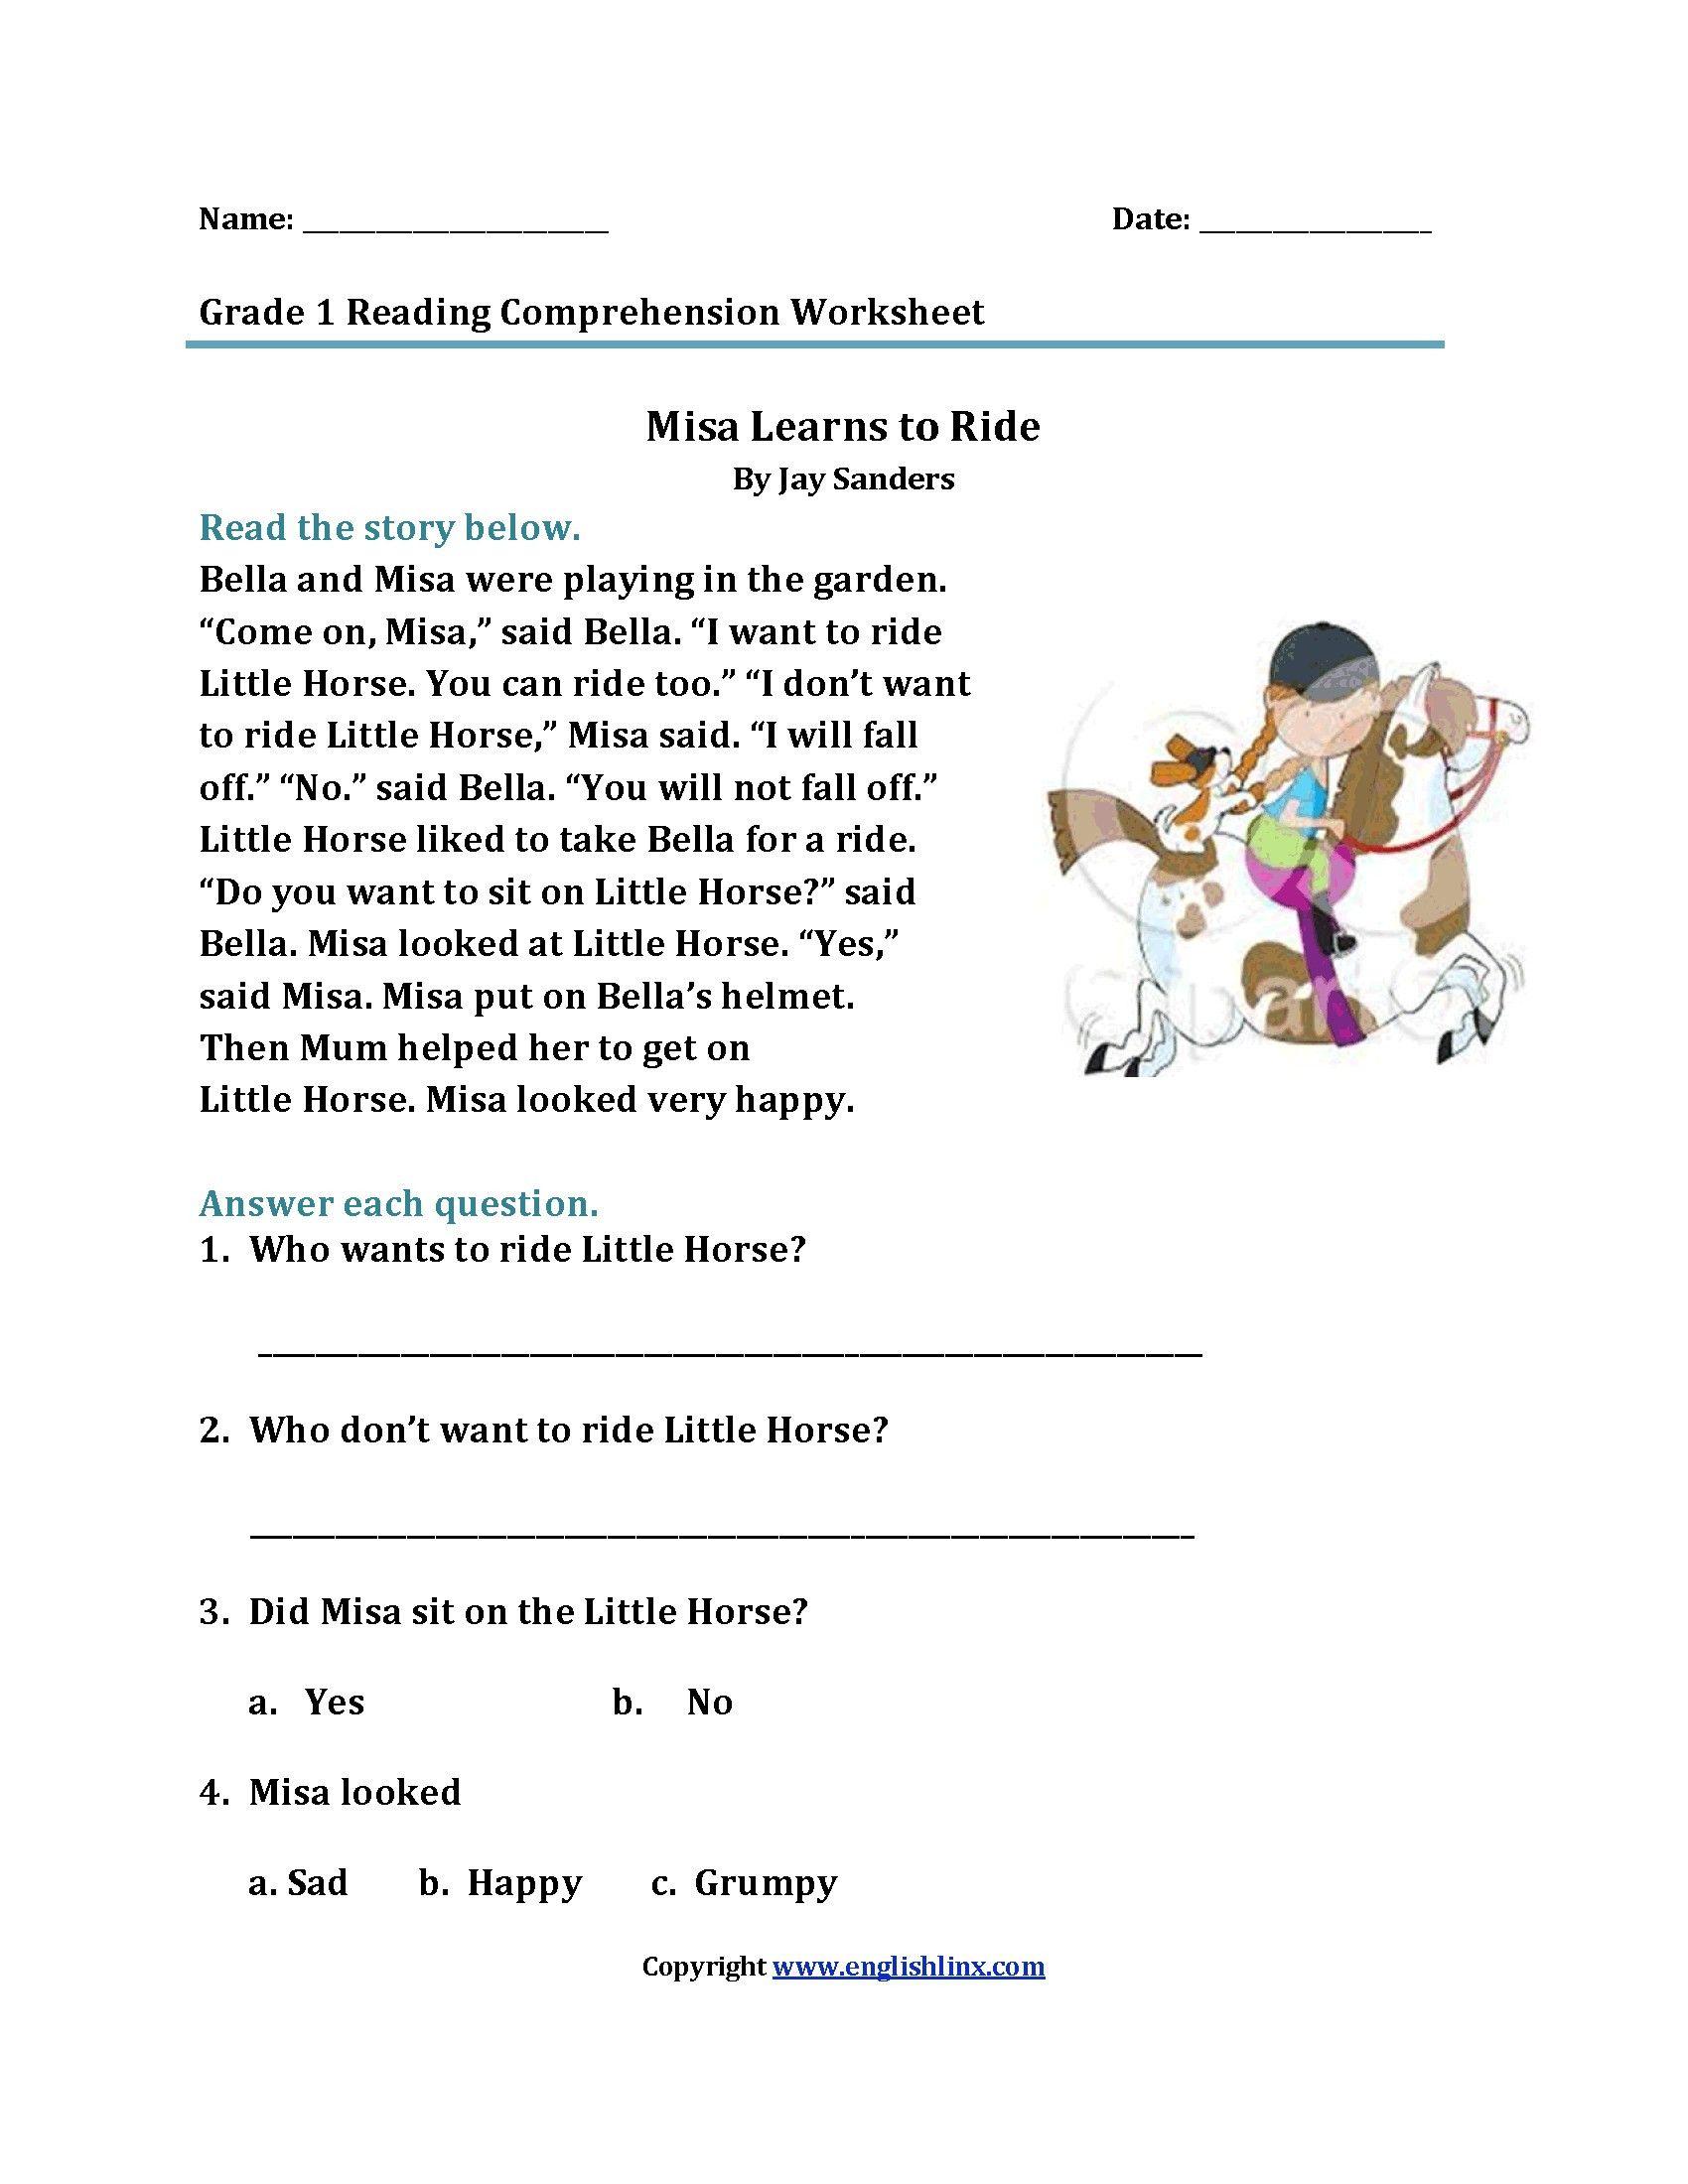 4 Free Math Worksheets Fourth Grade 4 Addition Adding whole Hundreds  worksheet…   Reading worksheets [ 2200 x 1700 Pixel ]